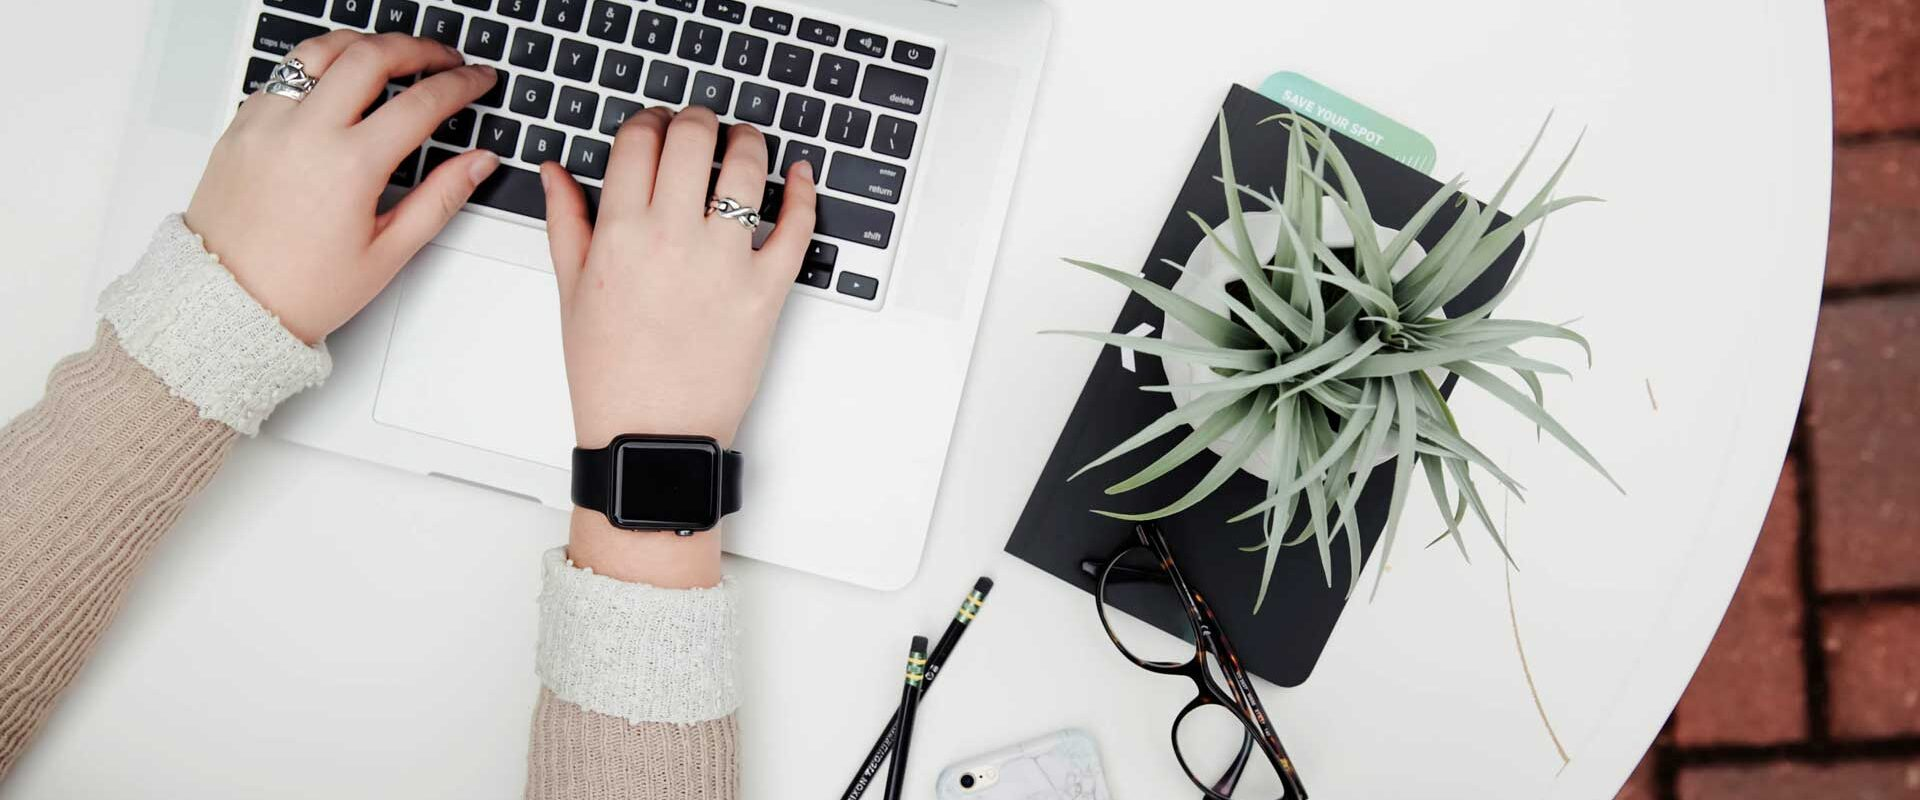 creativart-servizi-digital-marketing2